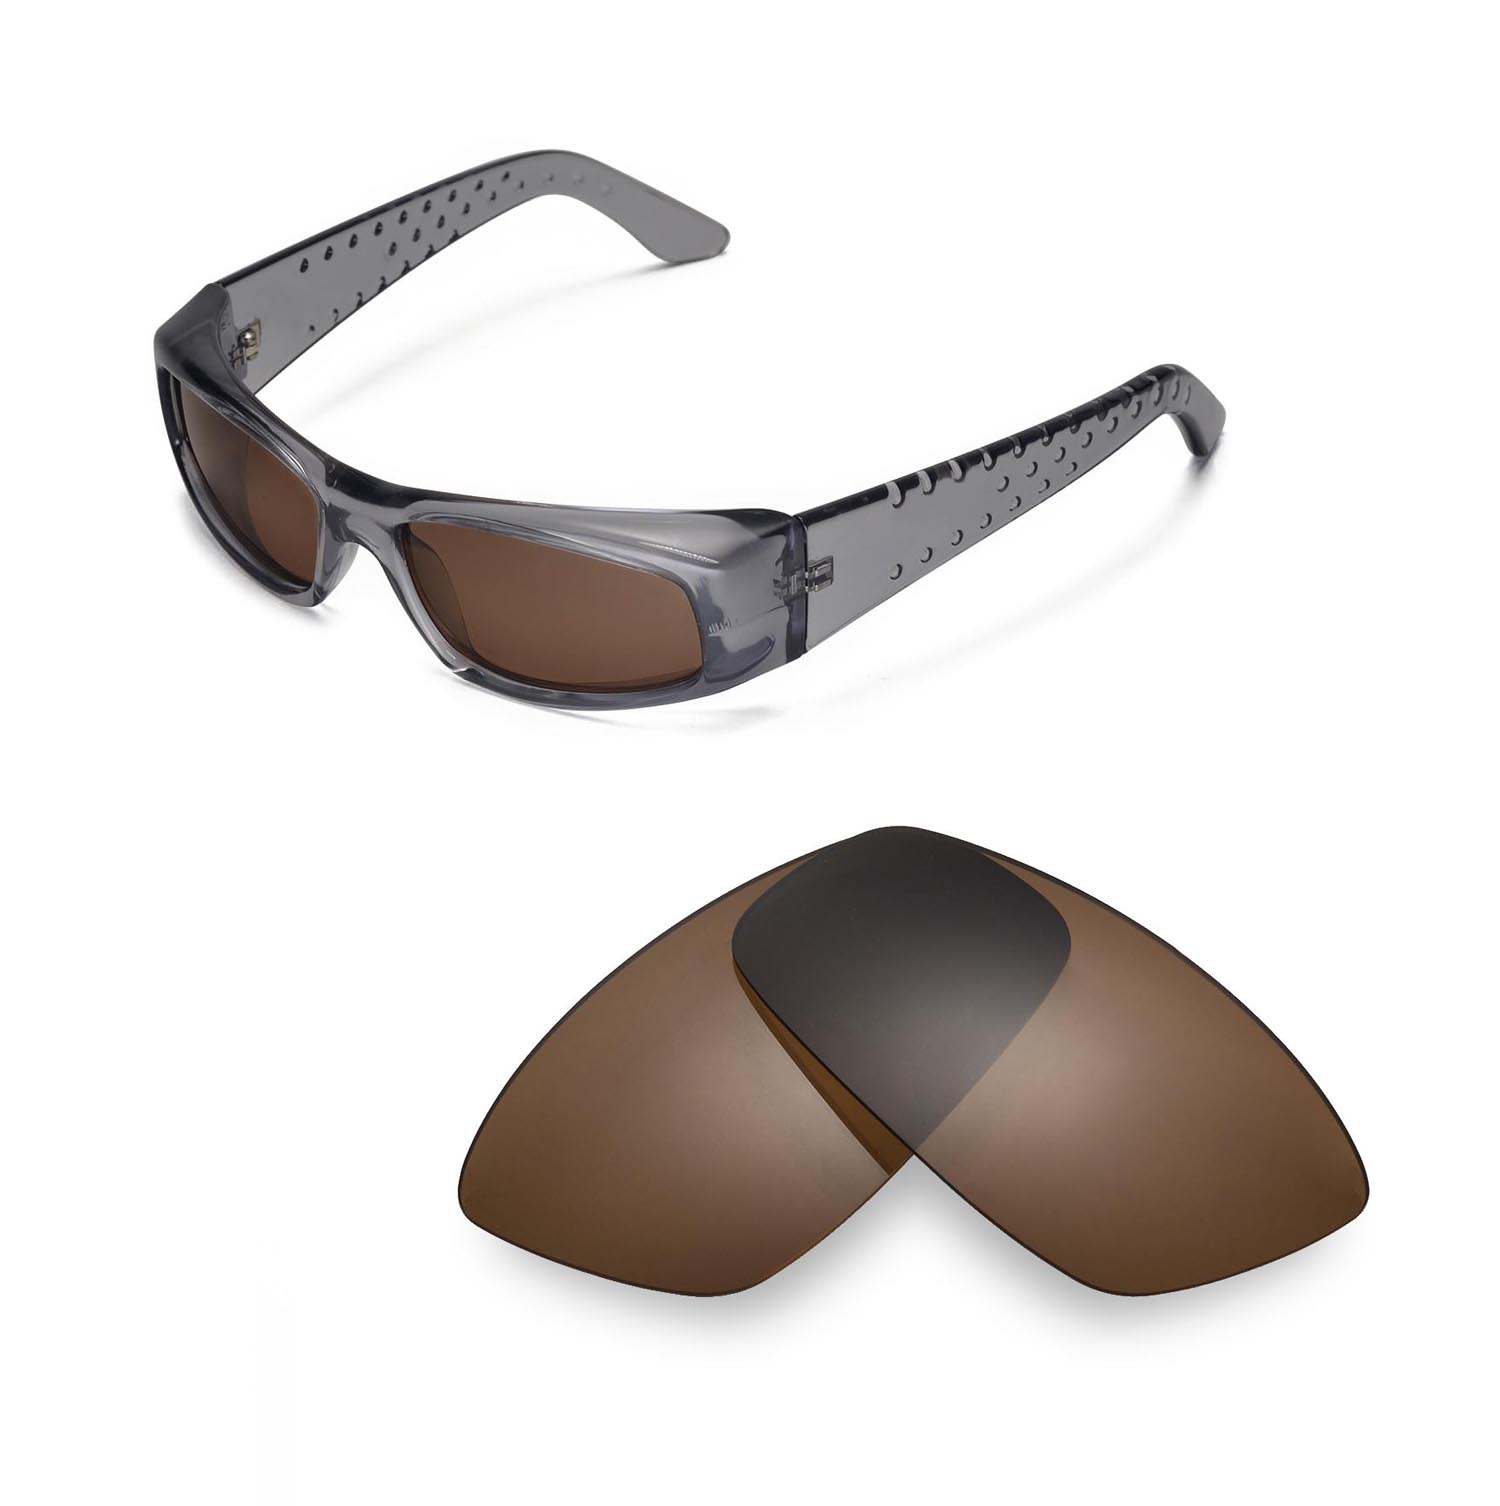 36d77daae6 Walleva Replacement Lenses for Spy Optic MC Sunglasses - Multiple ...